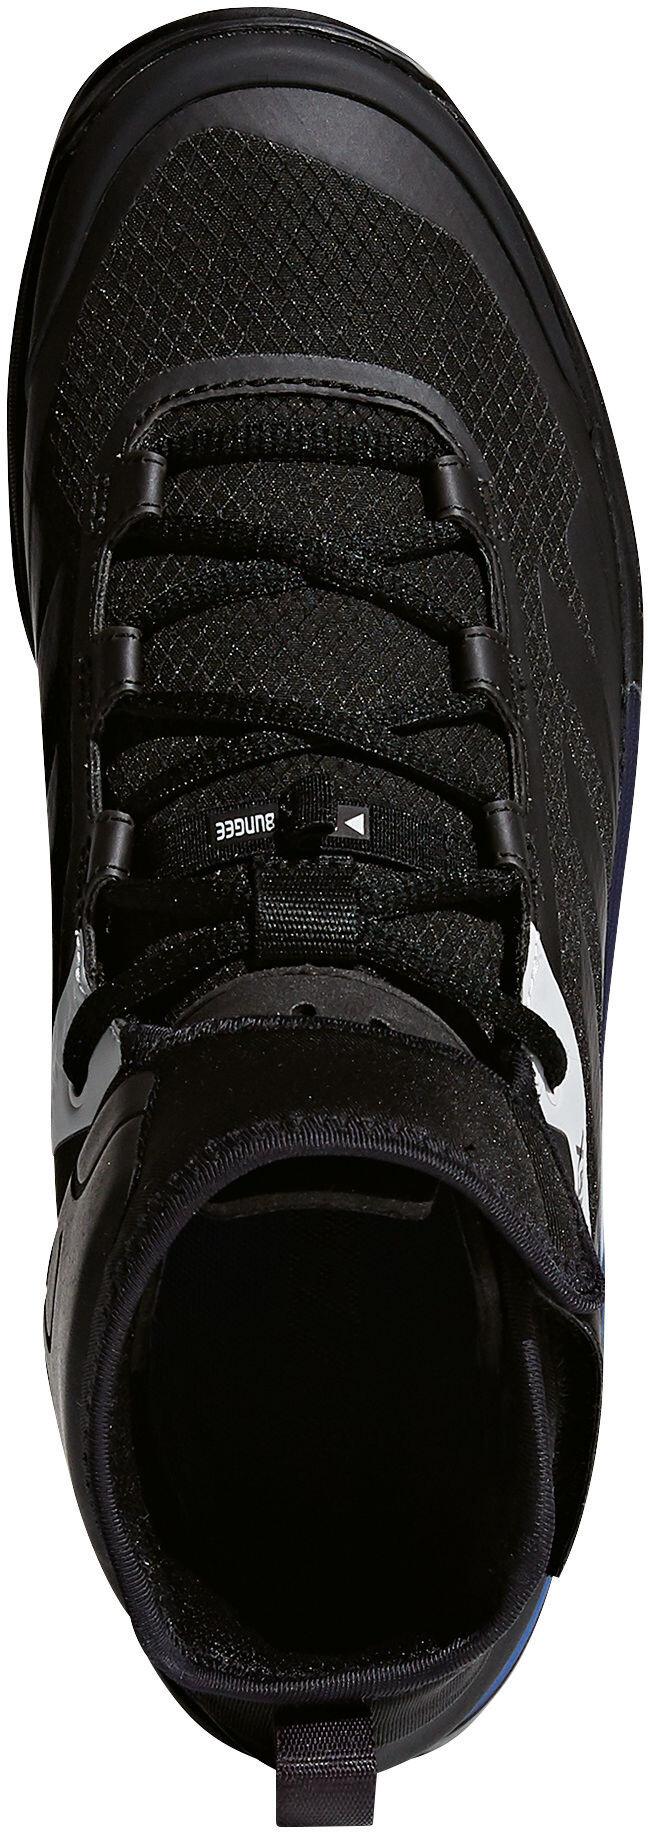 adidas TERREX Trail Cross Protect Shoes Men blue beautycore blackcollegiate navy